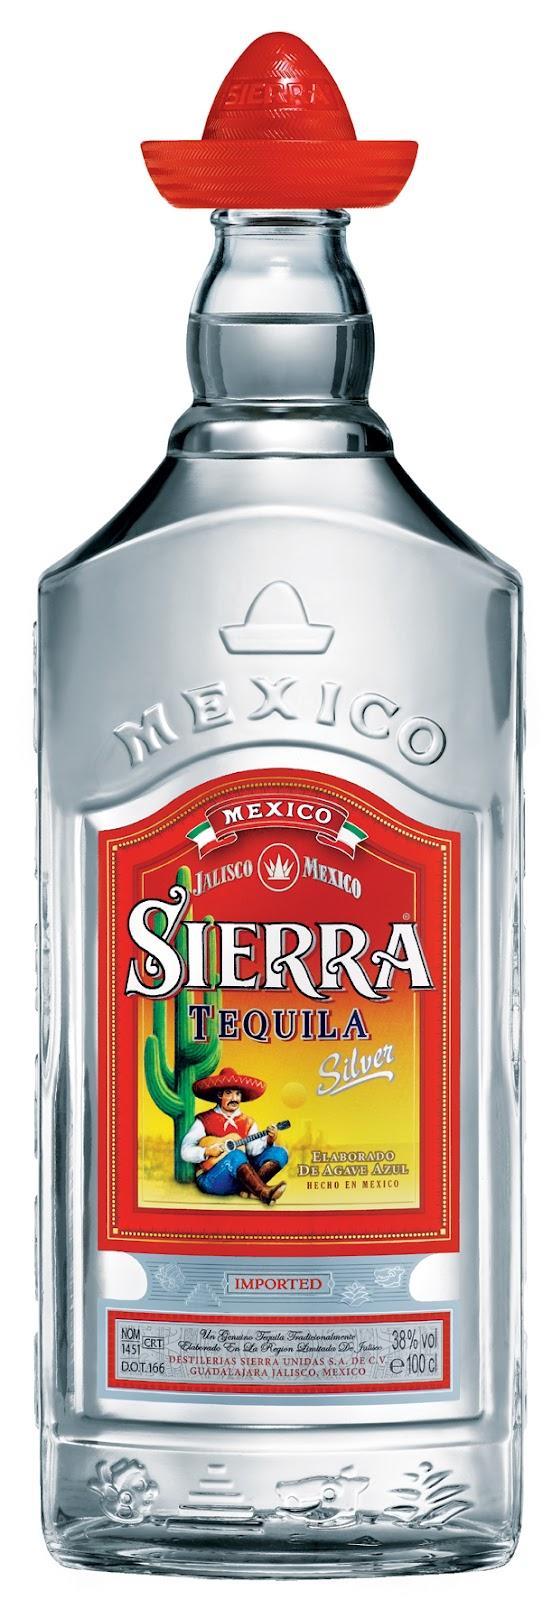 Tequila jose cuervo gold